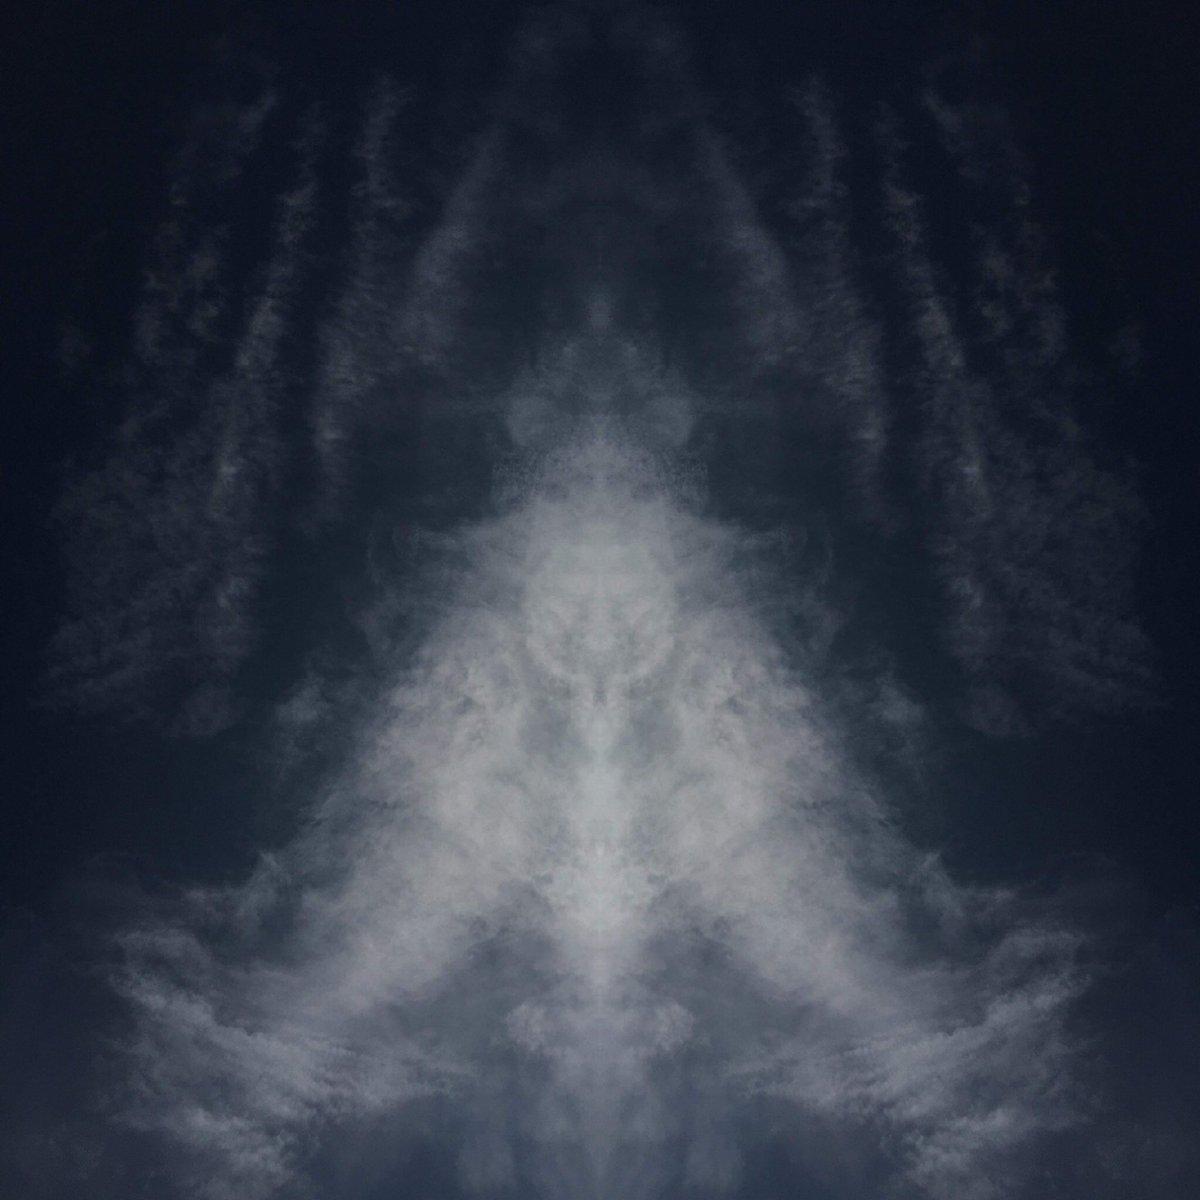 #sky #clouds #weather #nephele #divination #aeromancy #digitaledit #edits #edit #mirrorlab #ascendedmasters #magic #lightworker #indigo #starseed #lifepath9 #aliens #alternateuniverse #multidimensional #blueseraphim #blueavians #art #artist #creative #digitalart #angel #Angelspic.twitter.com/4FZDVI4R8b